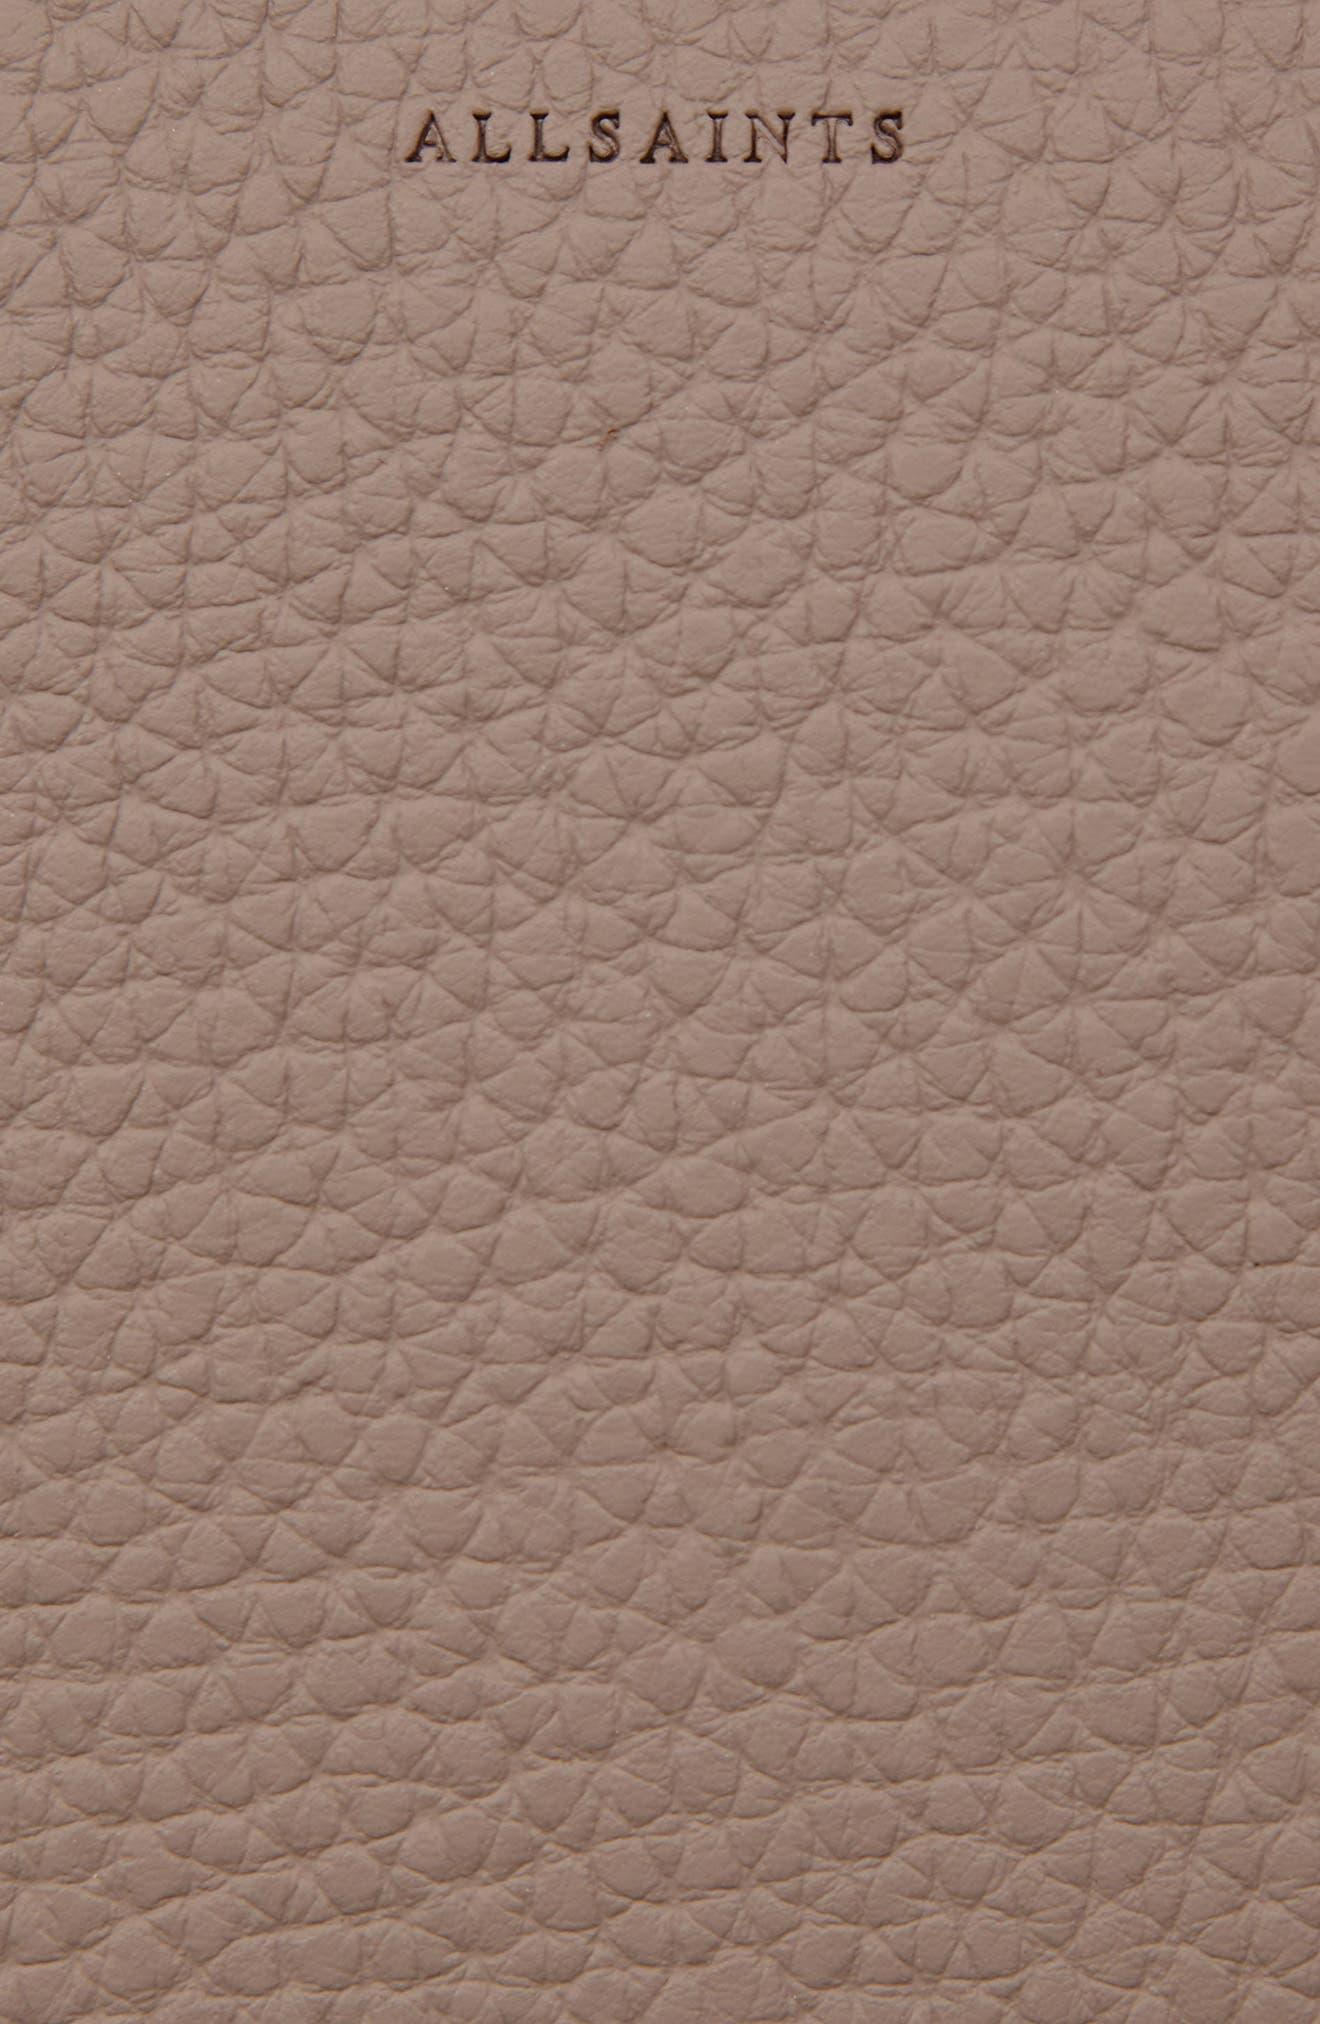 Kepi Mini Leather Crossbody Bag,                             Alternate thumbnail 6, color,                             ALMOND BROWN